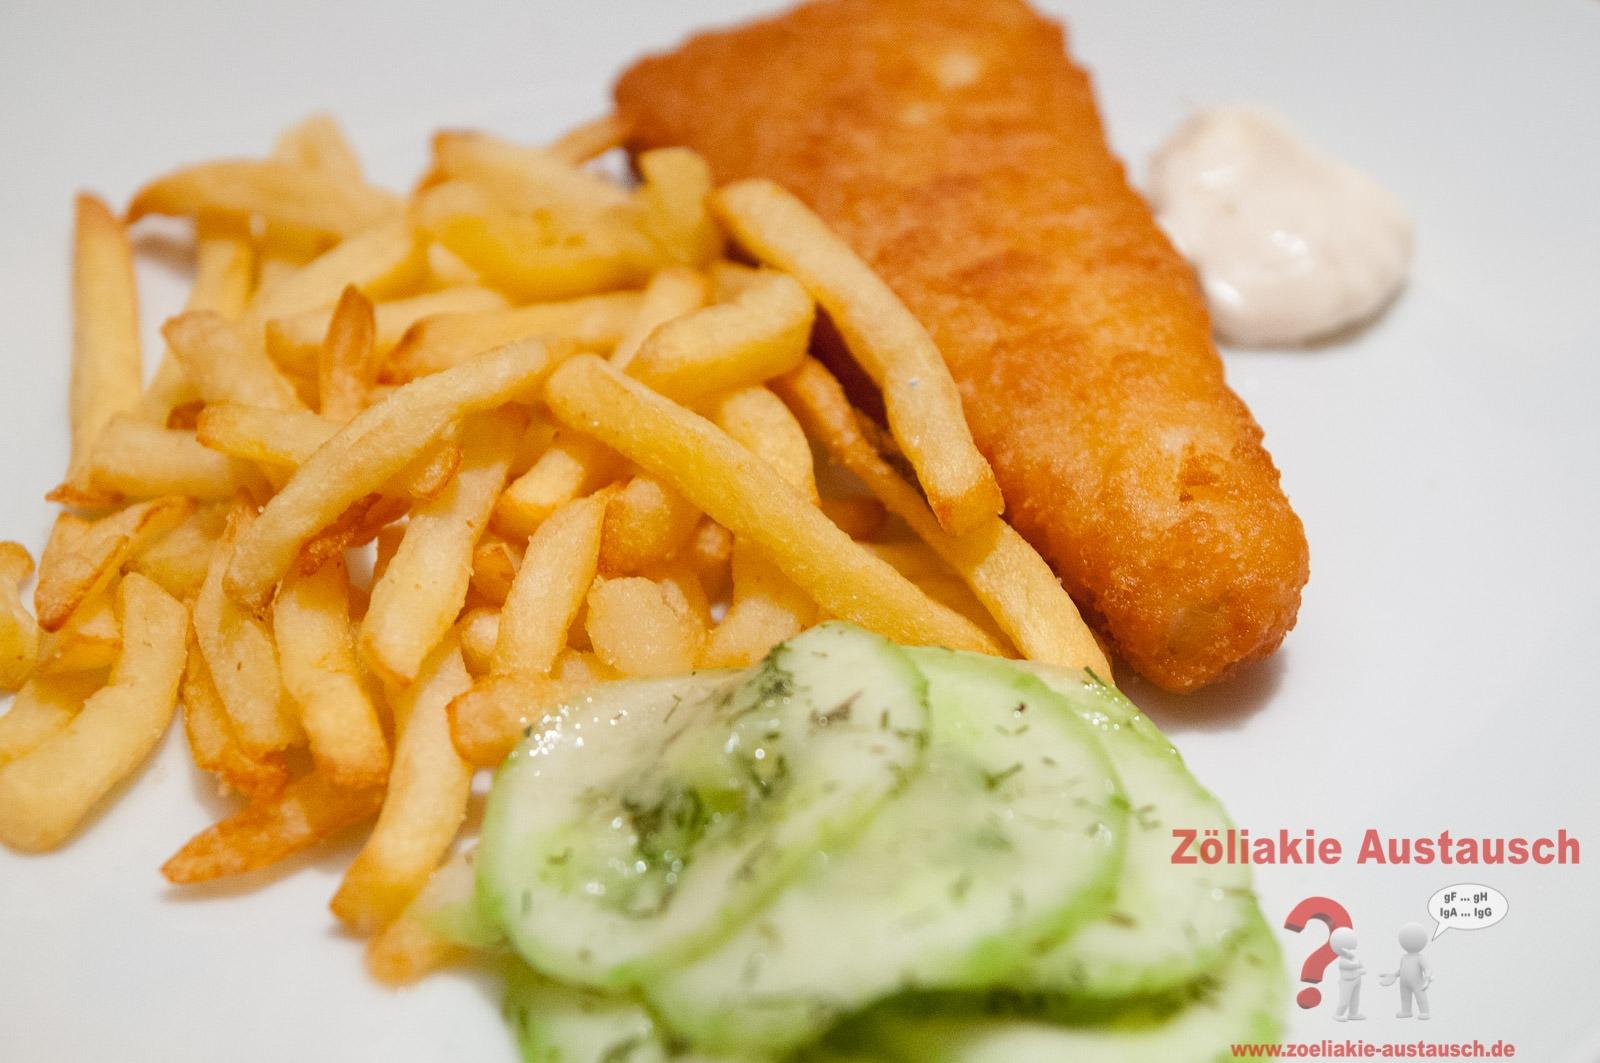 Zoeliakie_Austausch_BoFrost-032